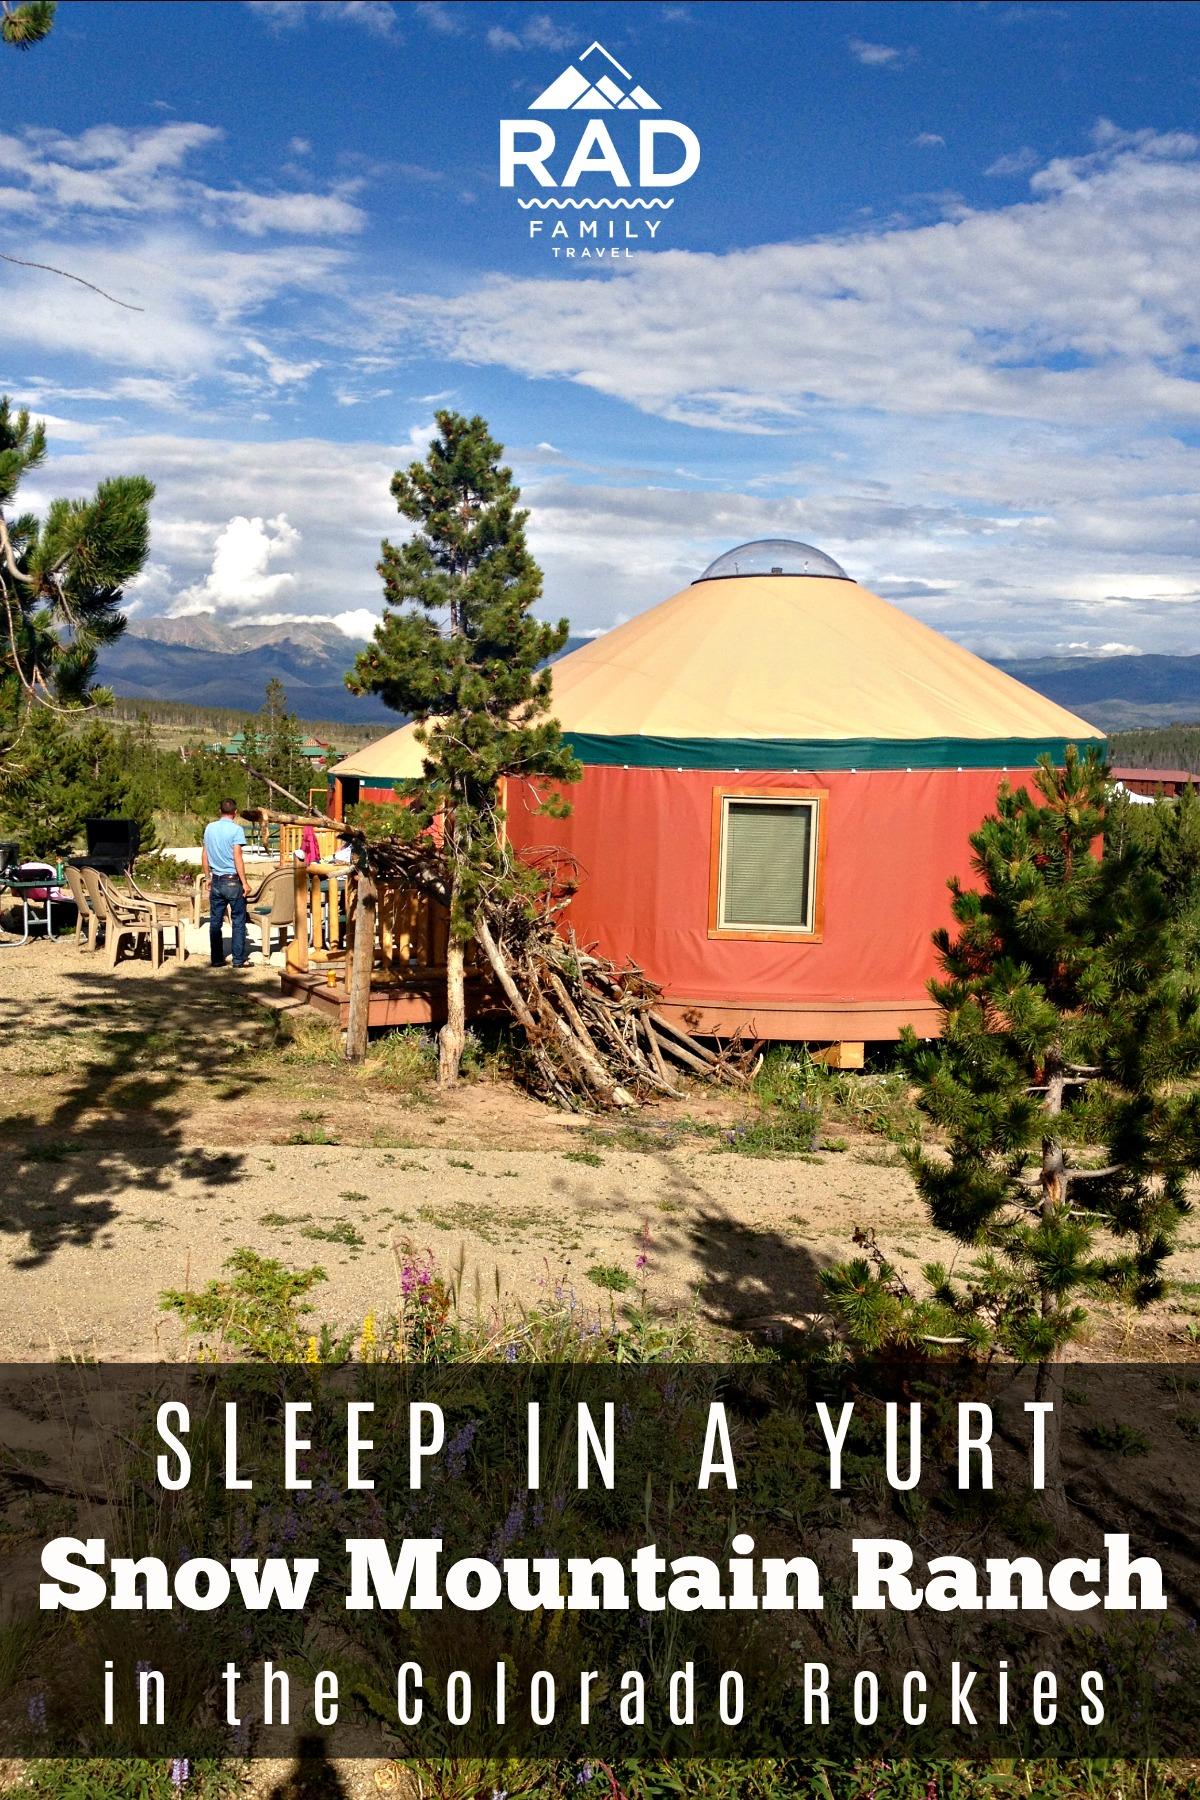 snow-mountain-ranch-yurt